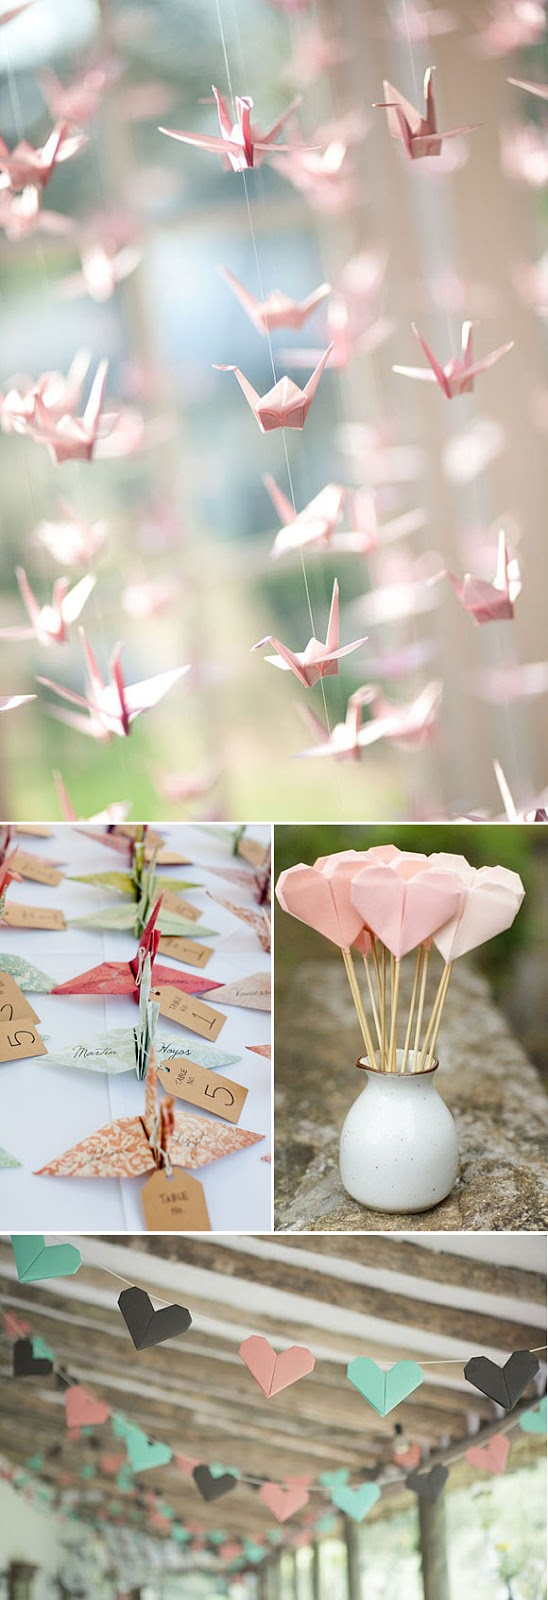 como decorar una boda con origami